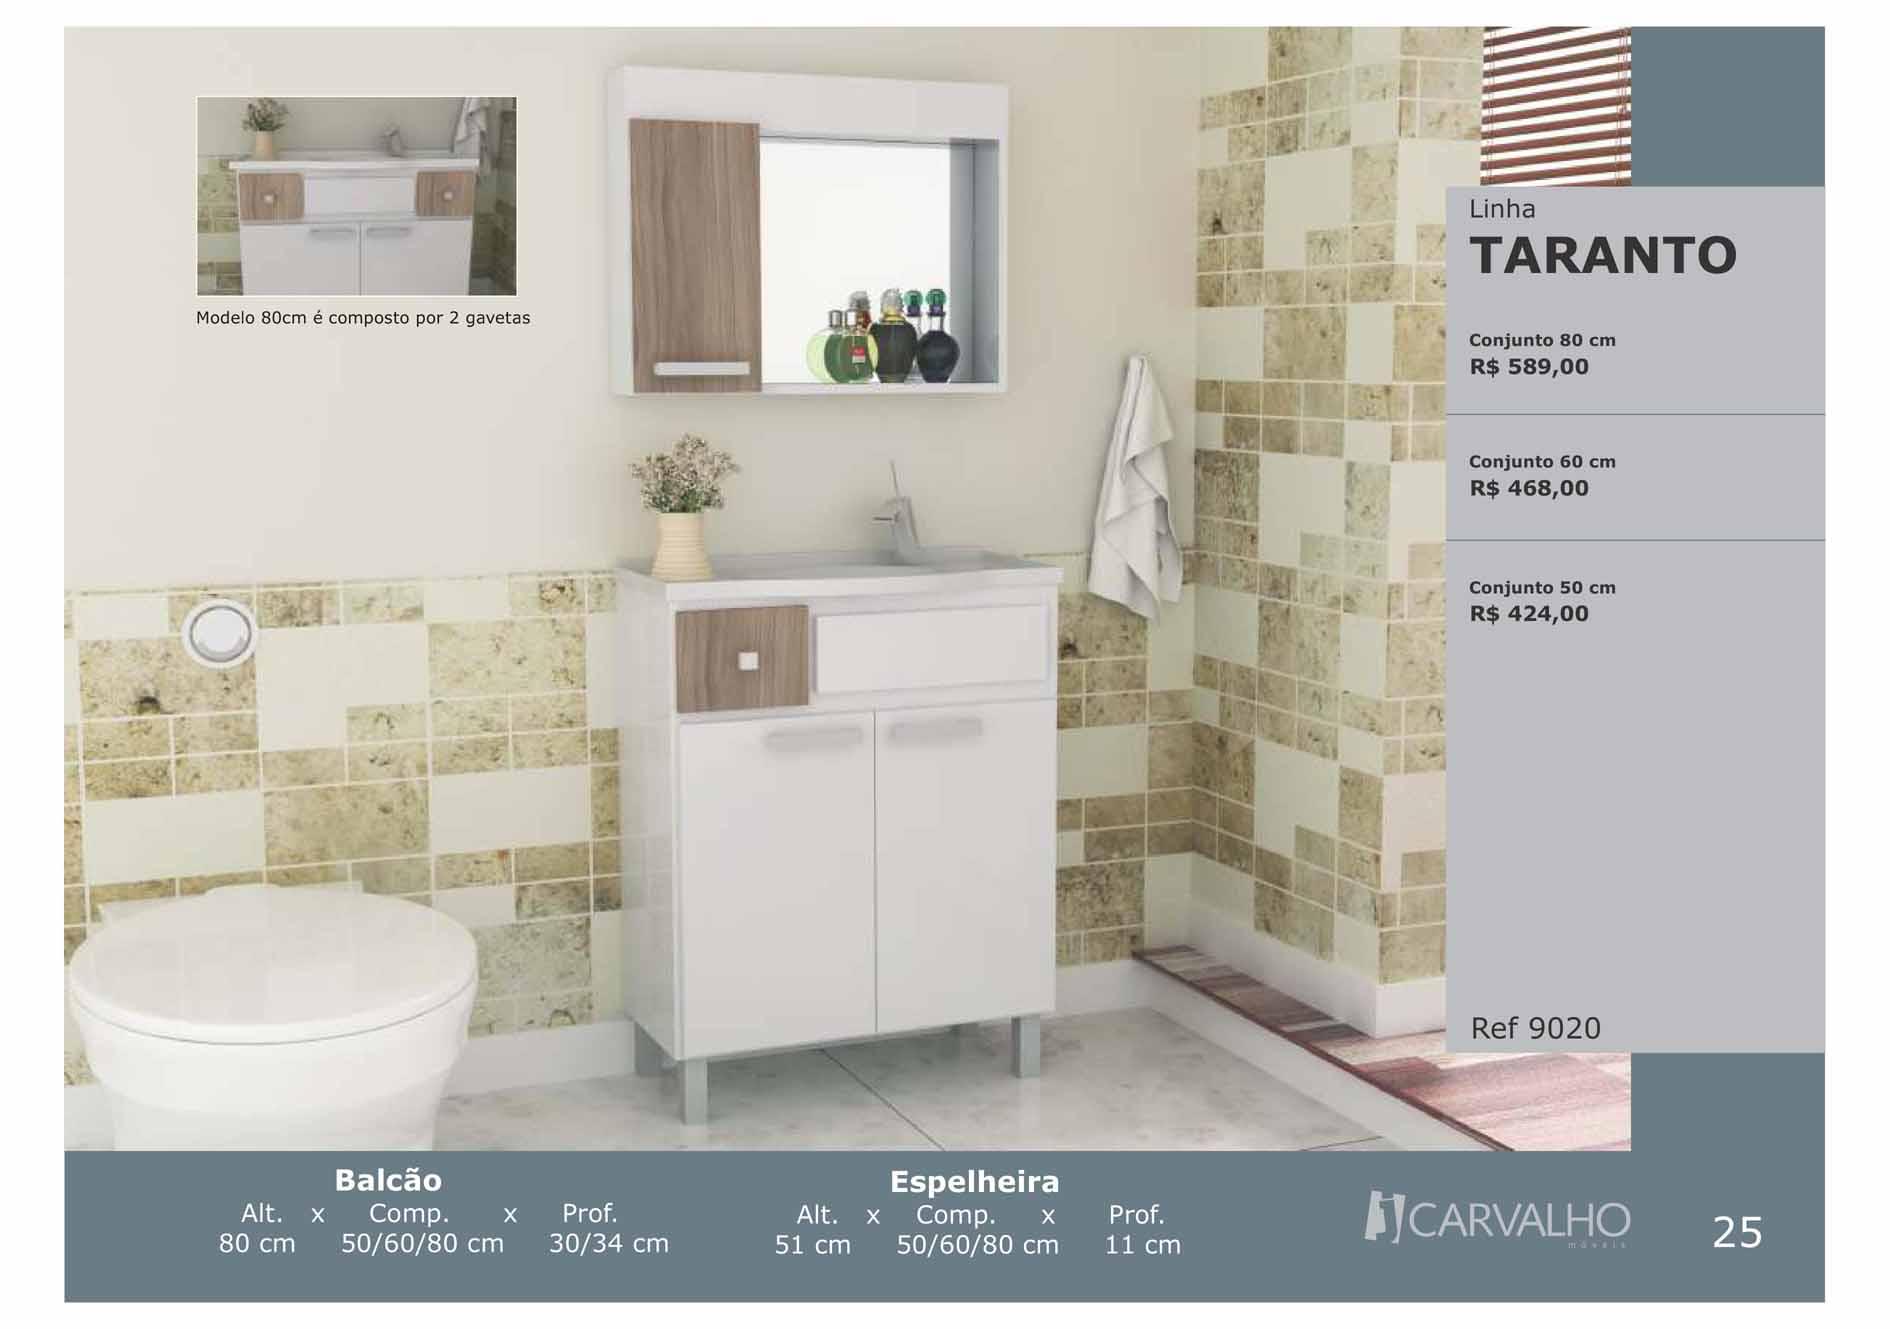 Taranto – Ref 9020